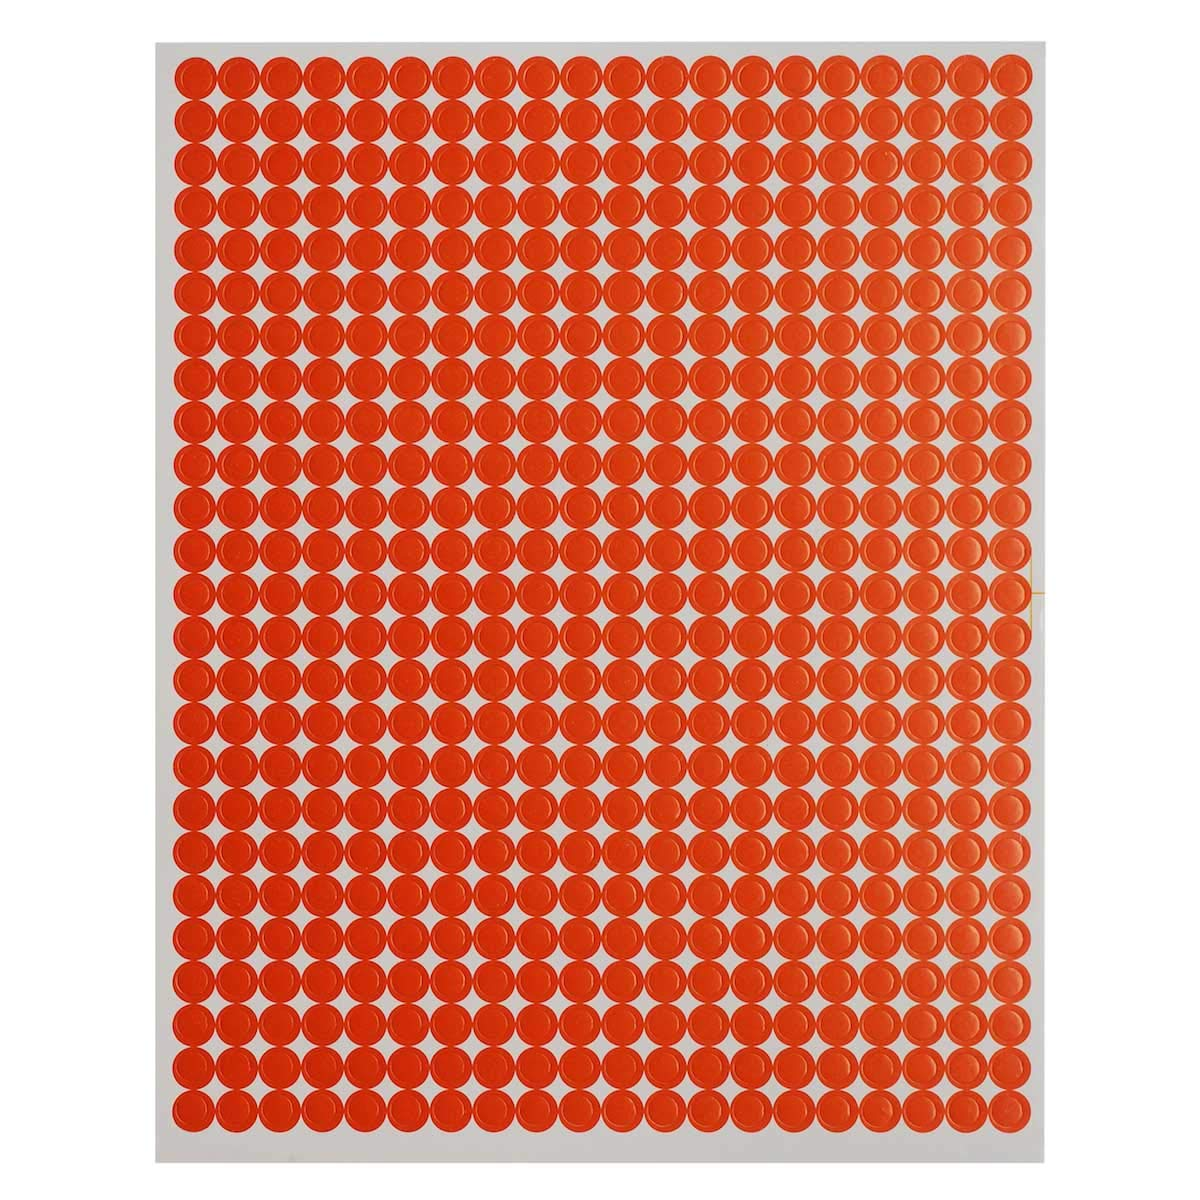 Orange ONUPGO Pack of 5000 1//4 Round Color Coding Dot Labels Sticker Removable Circle Colors Dot Labels